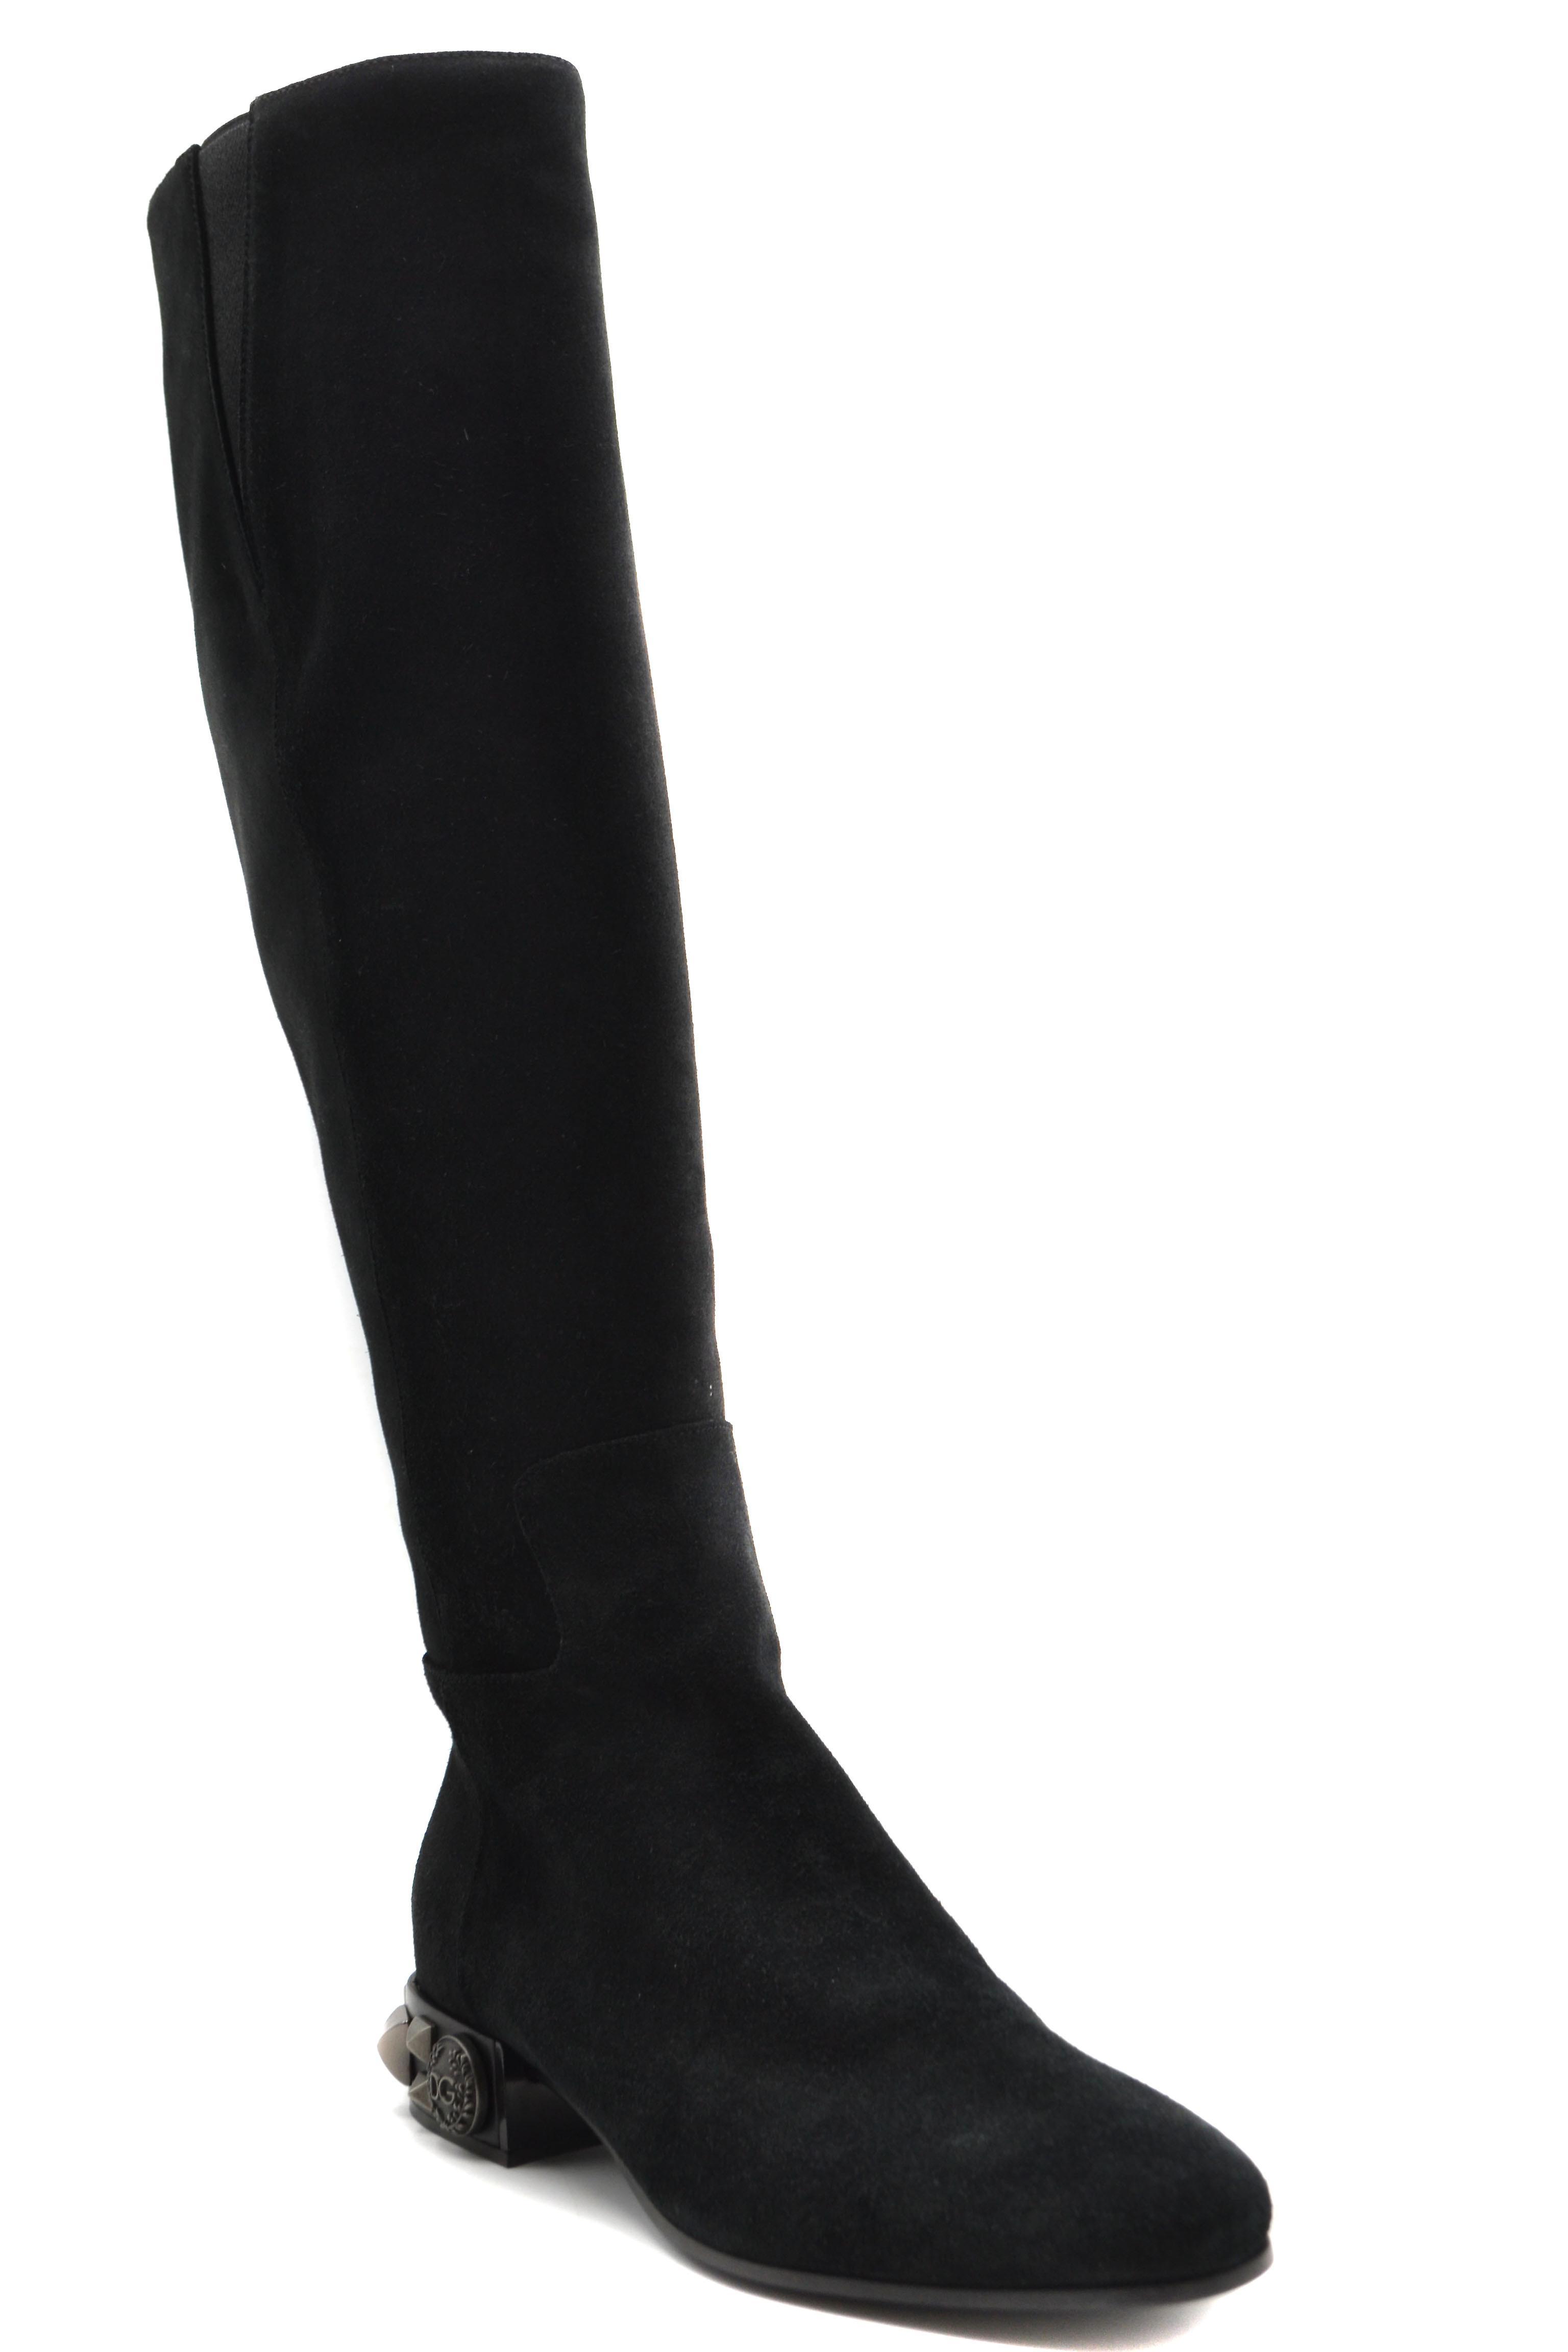 Dolce E Gabbana Ezbc006220 Women's Black Suede Boots